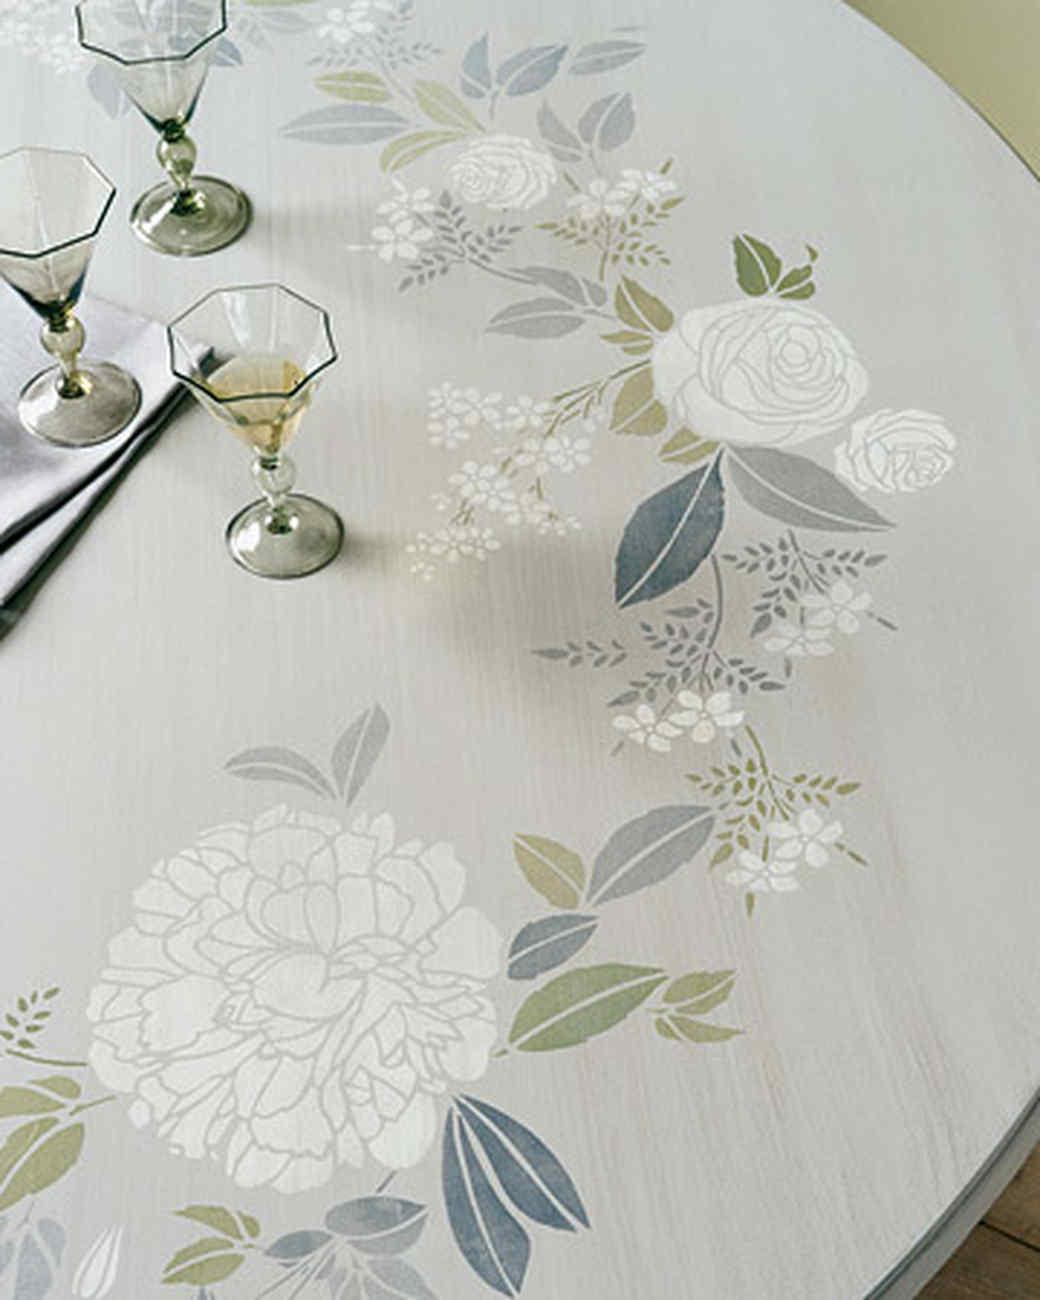 Garden-Print Stenciled Tabletop